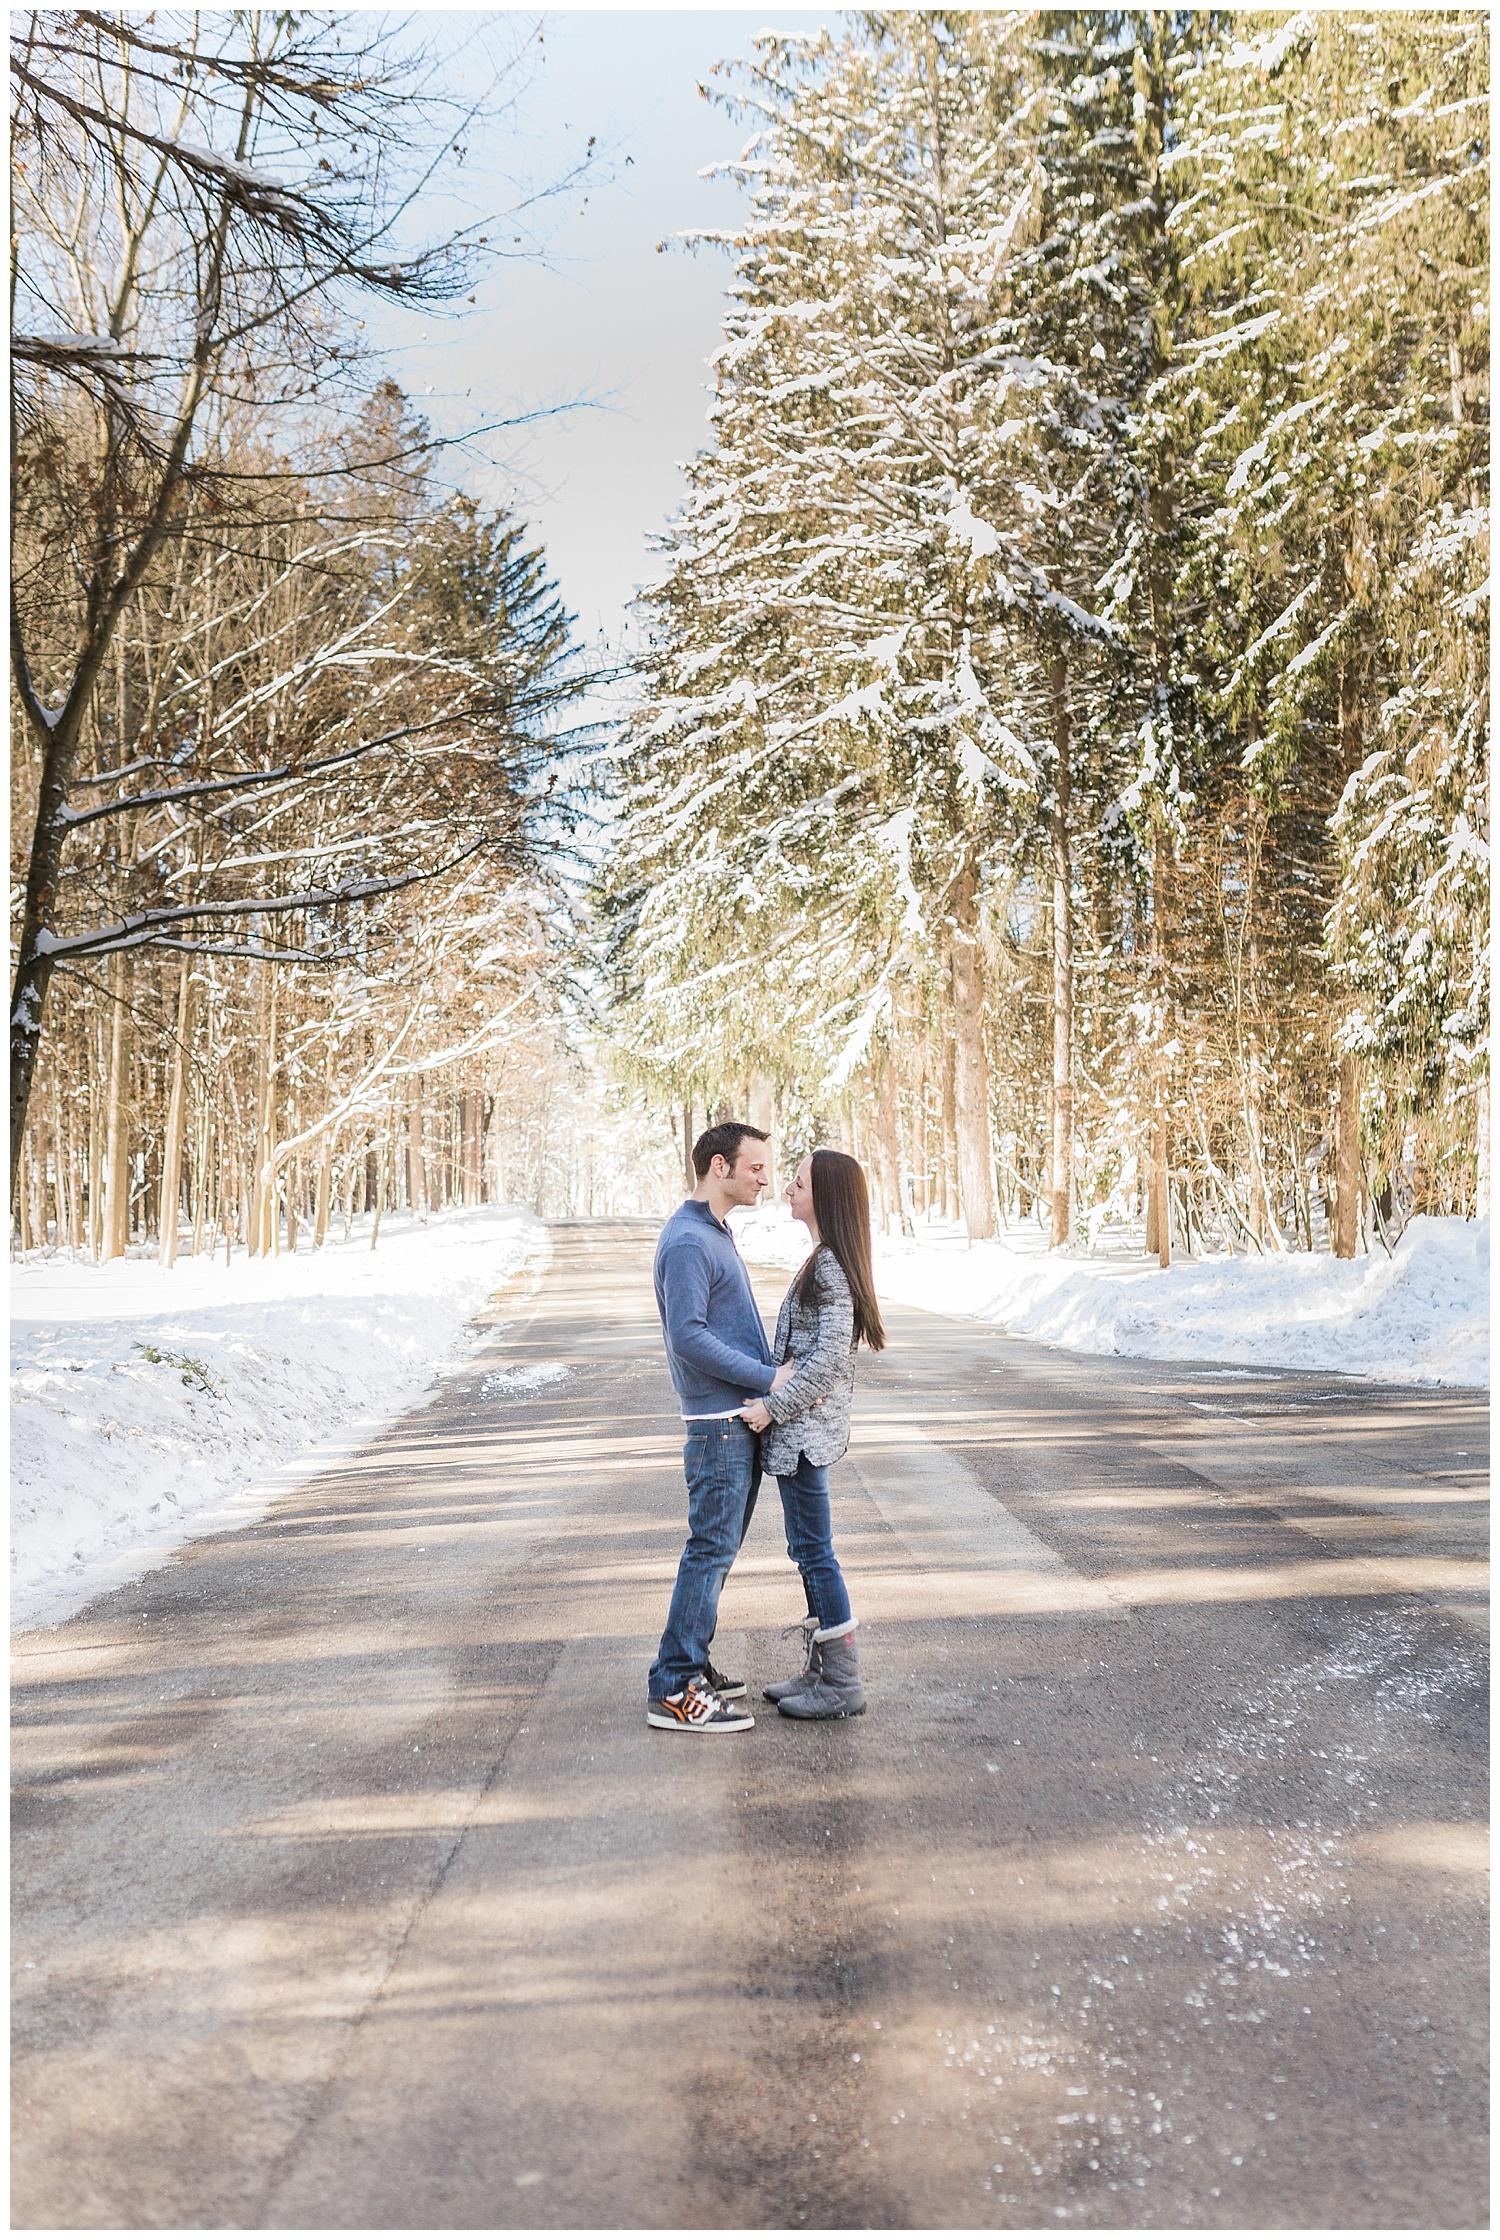 Matt and Jessica - Winter in Letchworth -6_Buffalo wedding photography.jpg